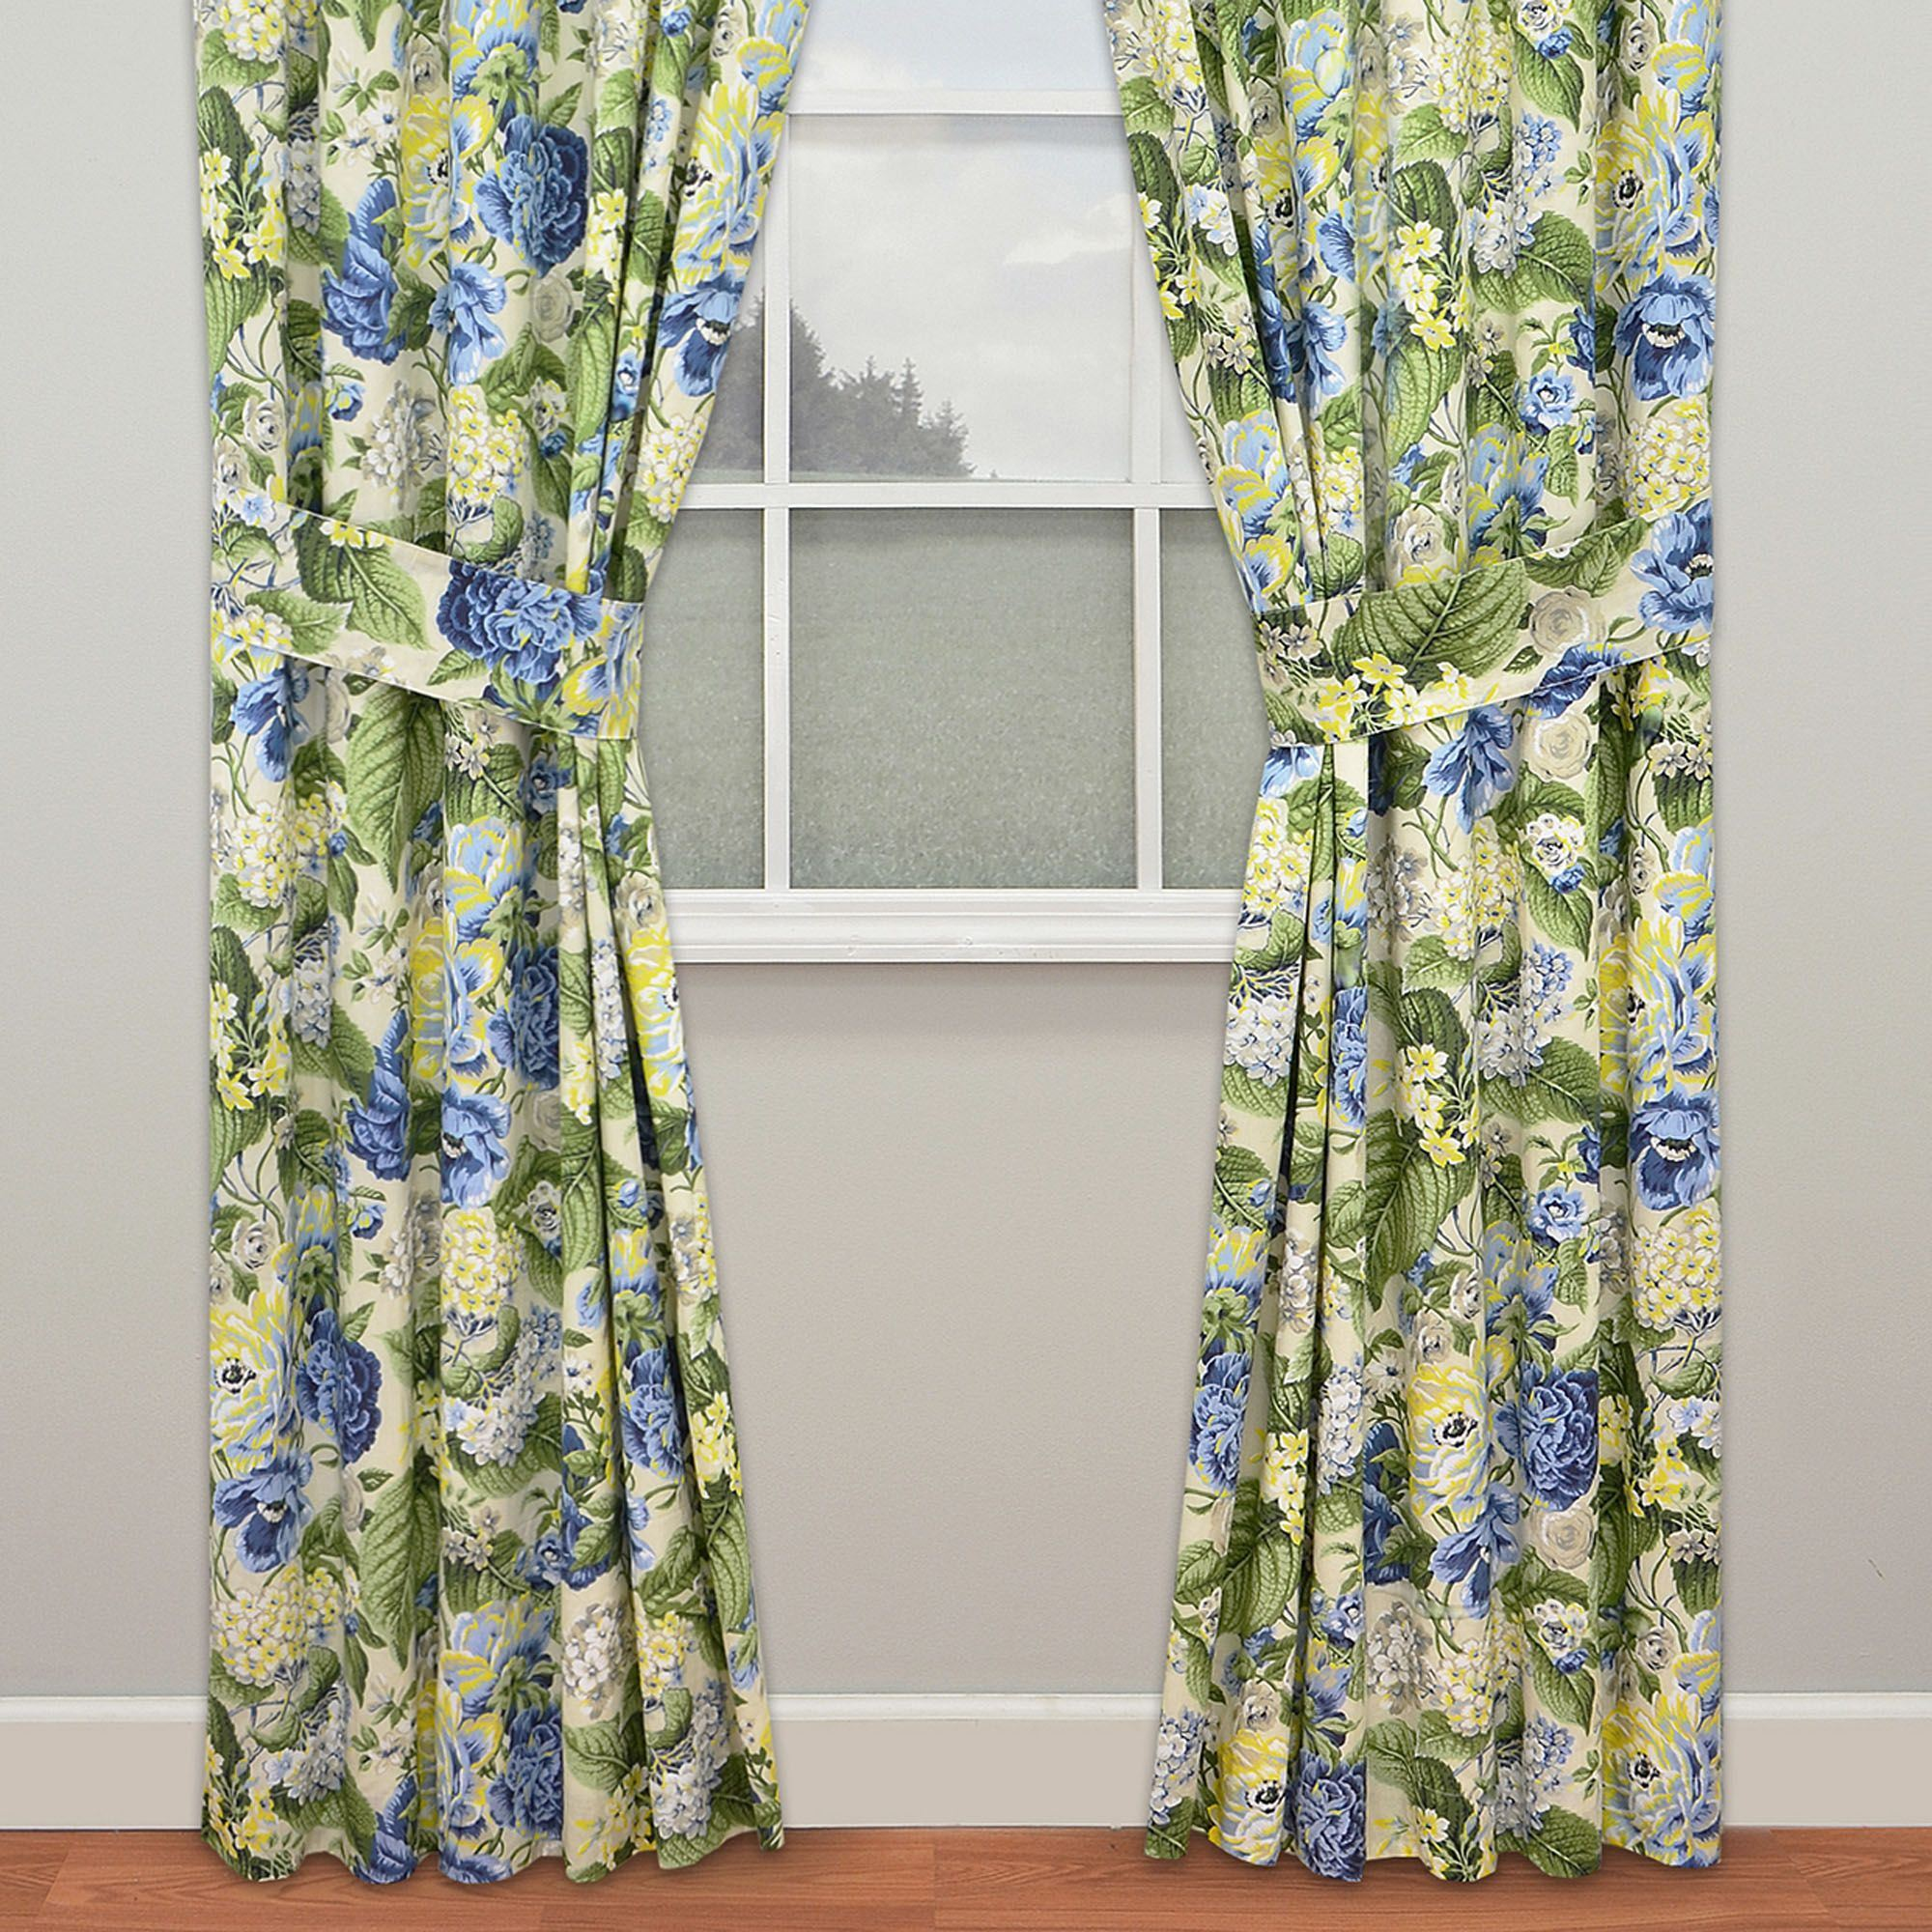 floral flourish window treatment by waverly